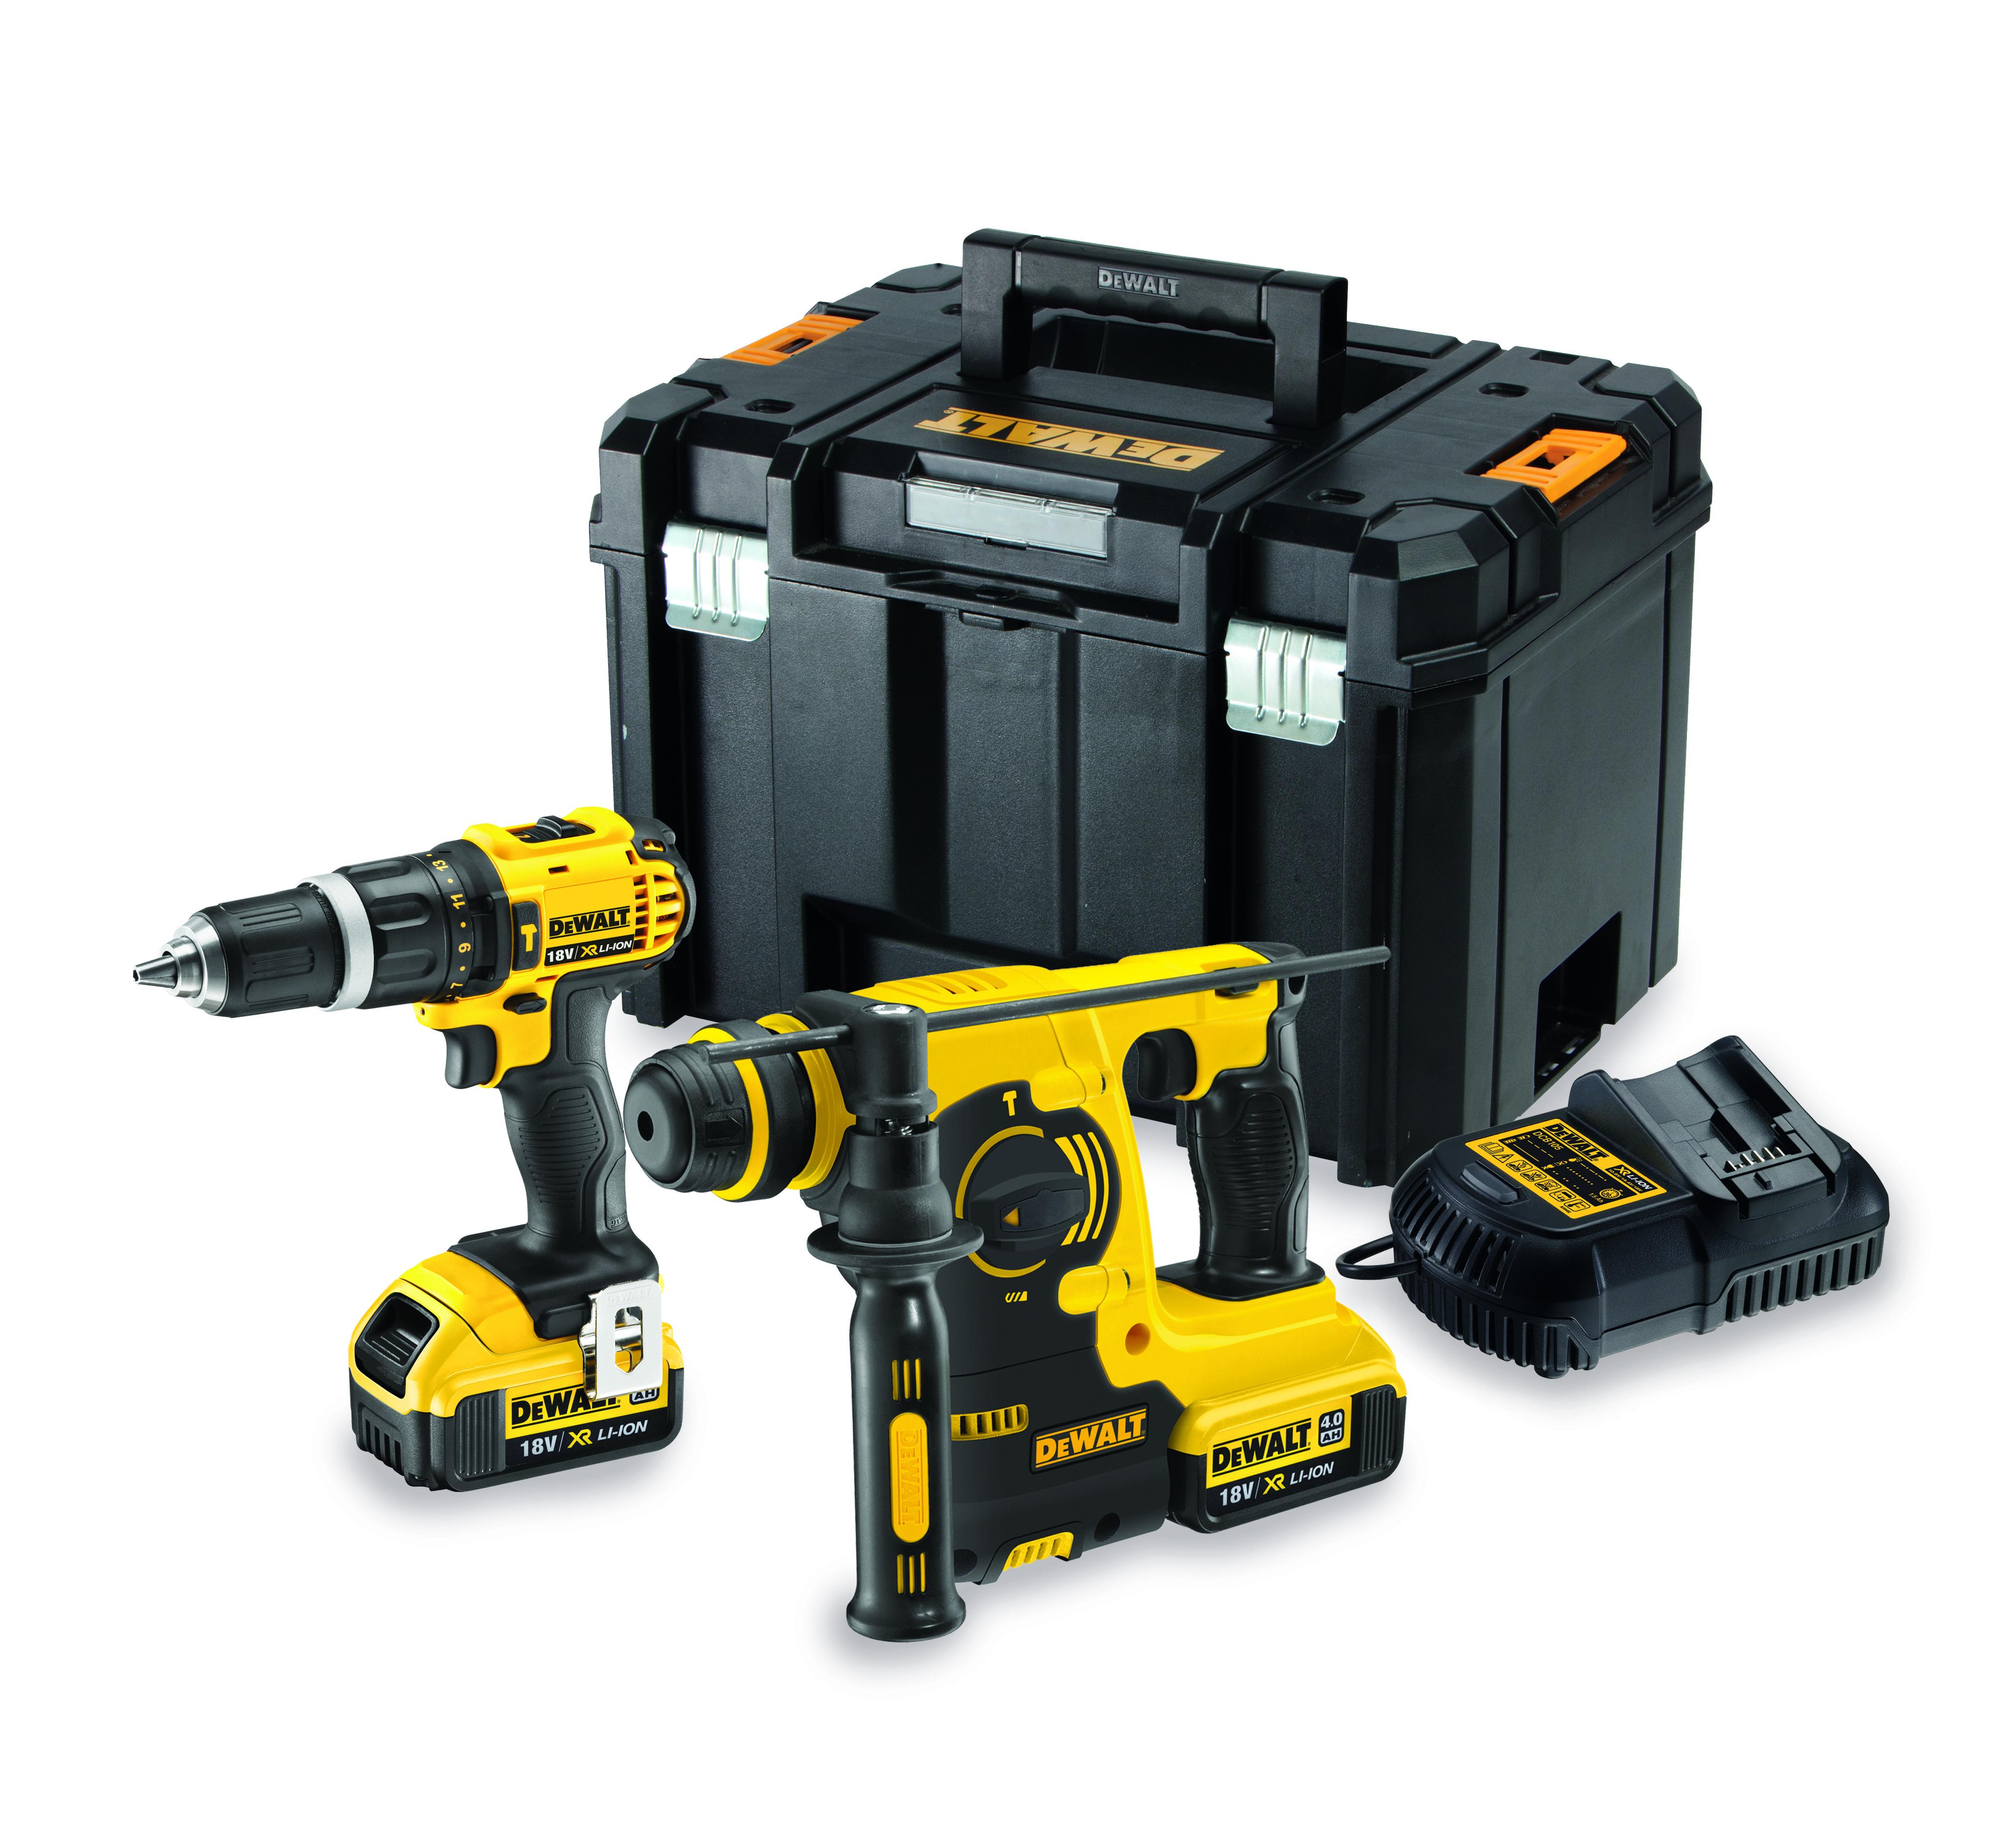 Our Top 5 DeWalt Power Tools